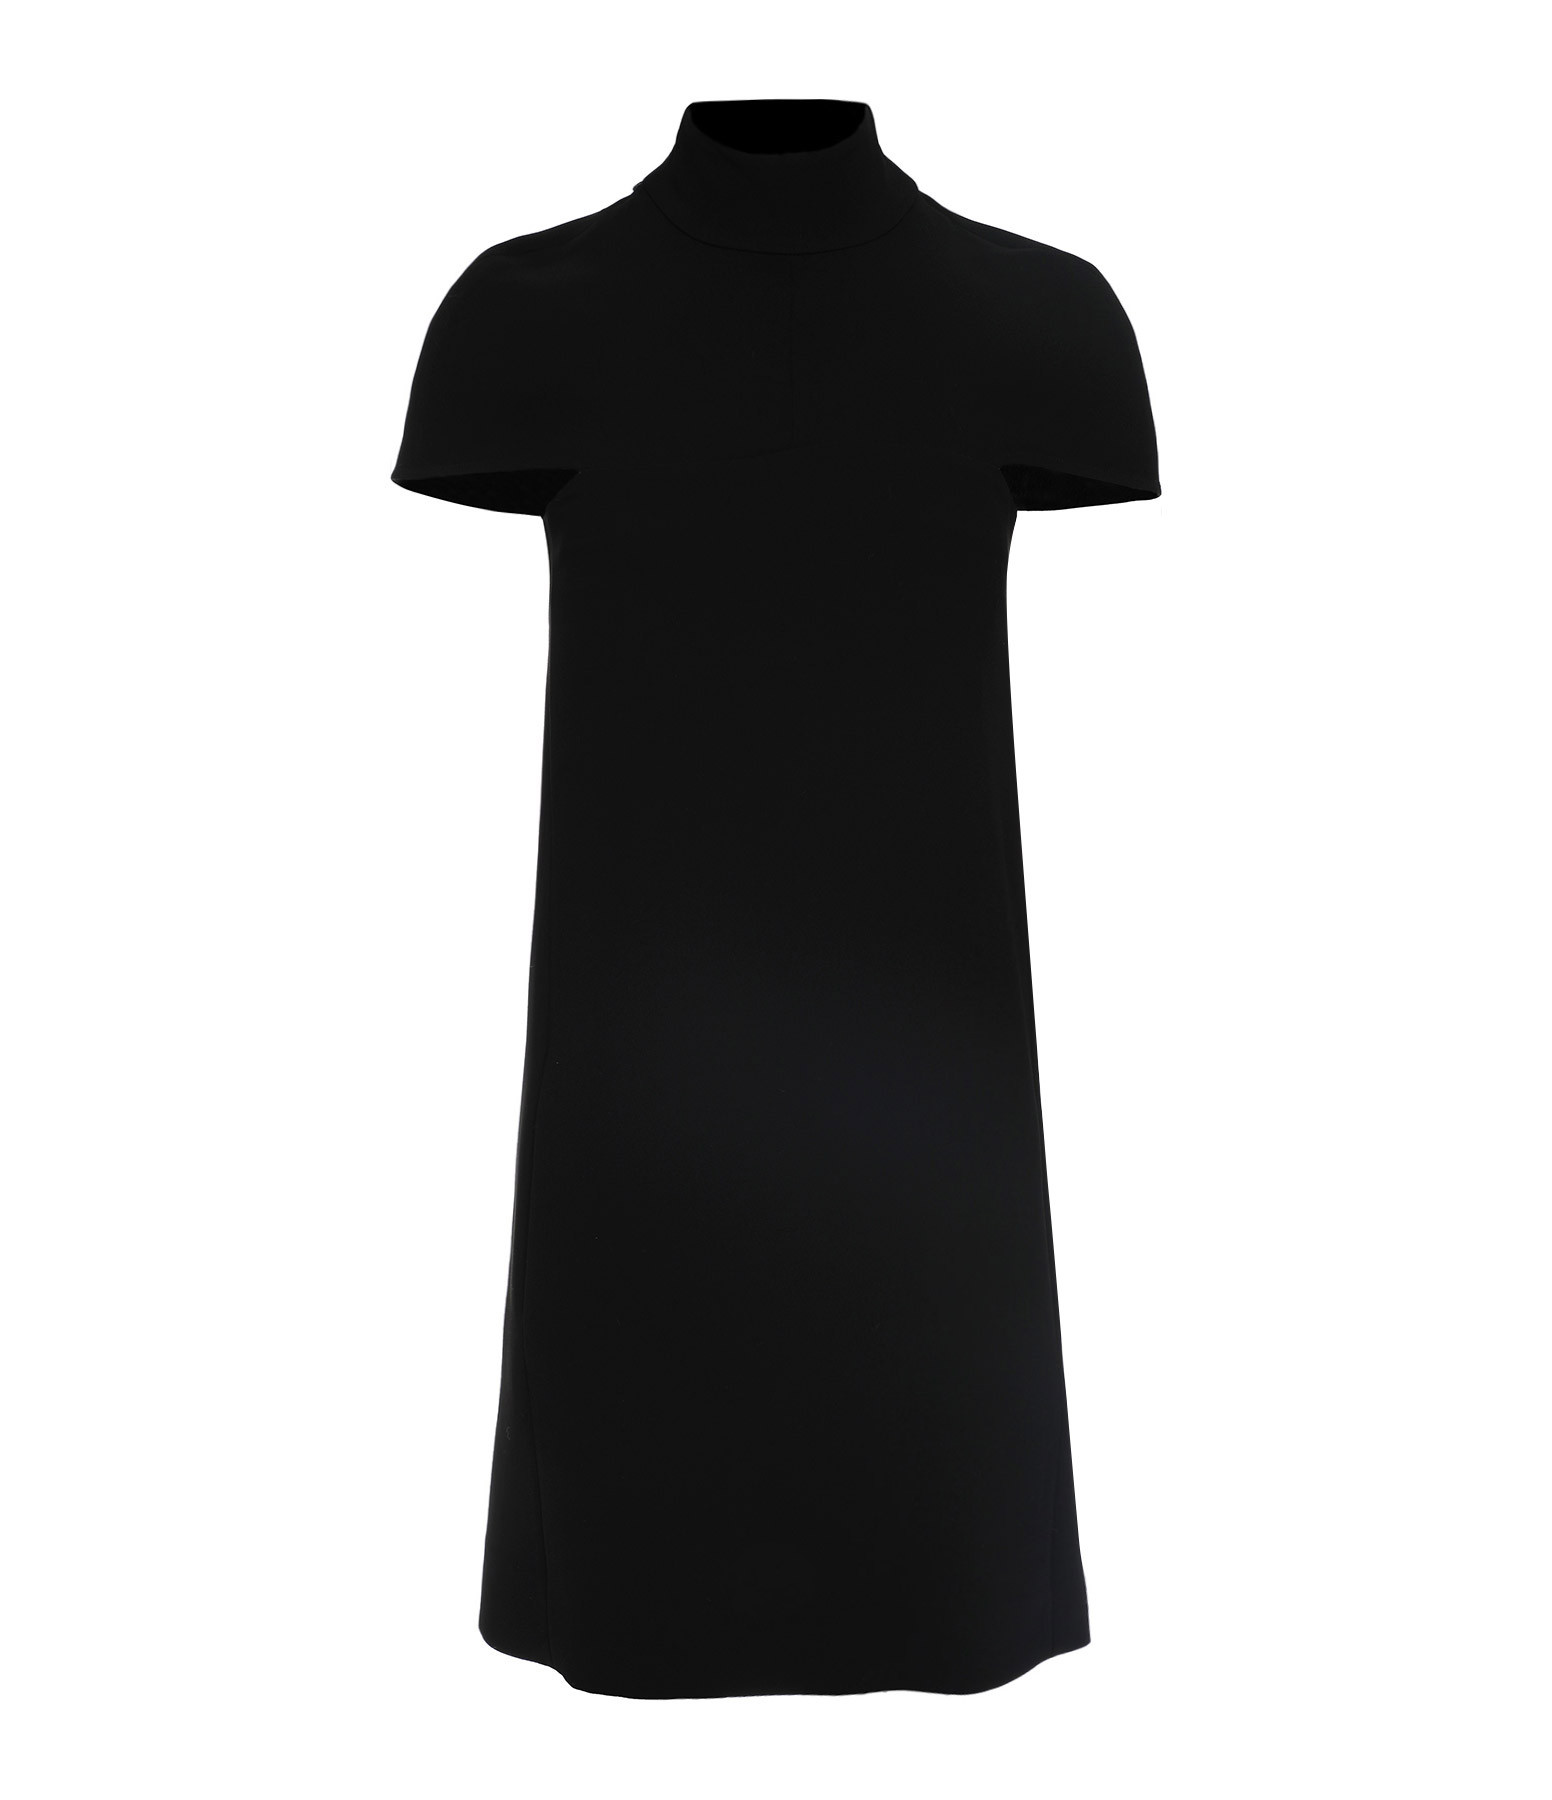 VICTORIA VICTORIA BECKHAM - Robe Cape Crêpe Noir